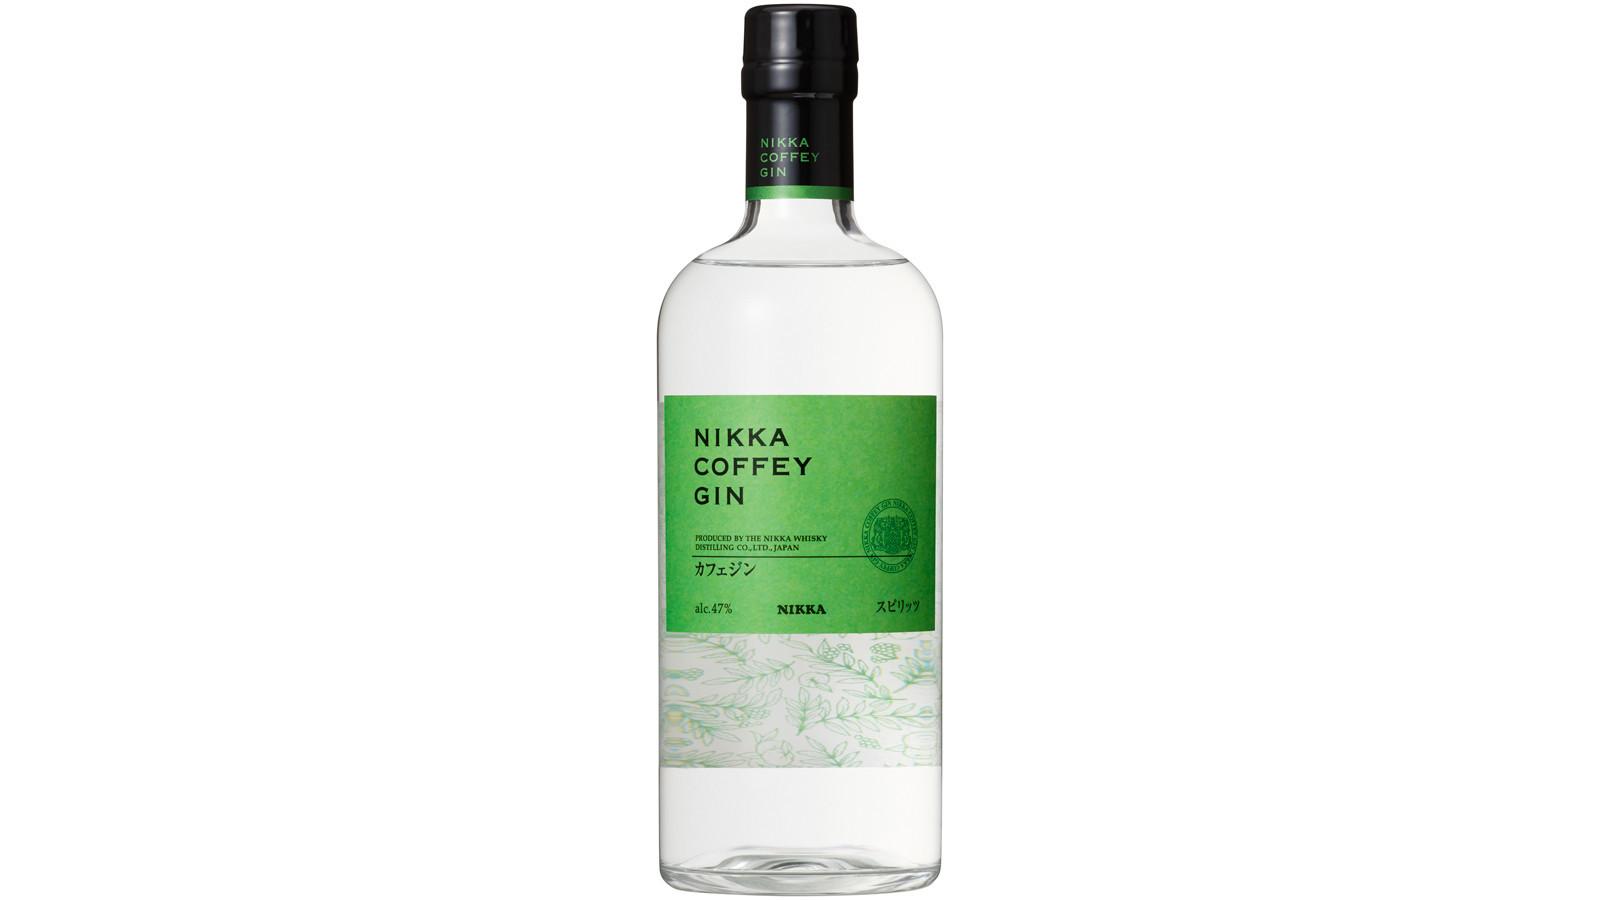 Nikka Coffey Gin.